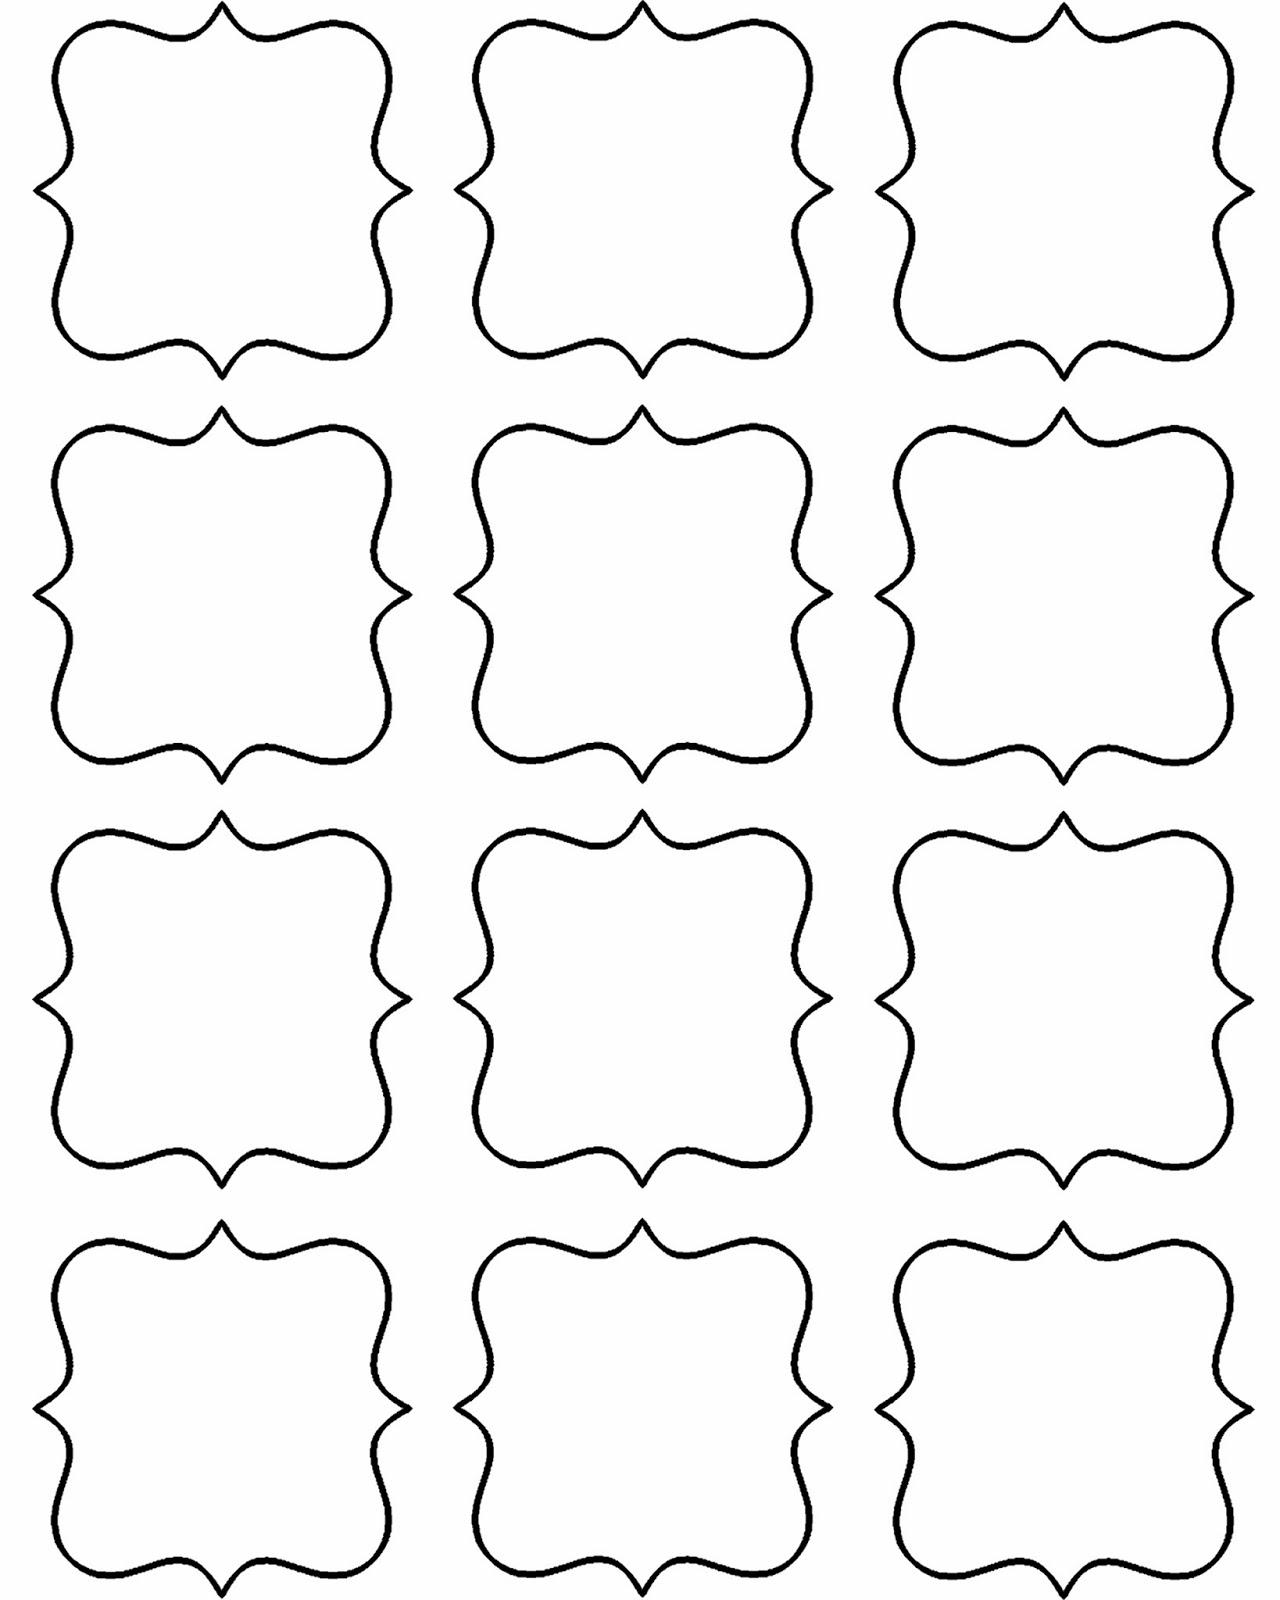 doodlecraft freebie week gift tags and labels. Black Bedroom Furniture Sets. Home Design Ideas